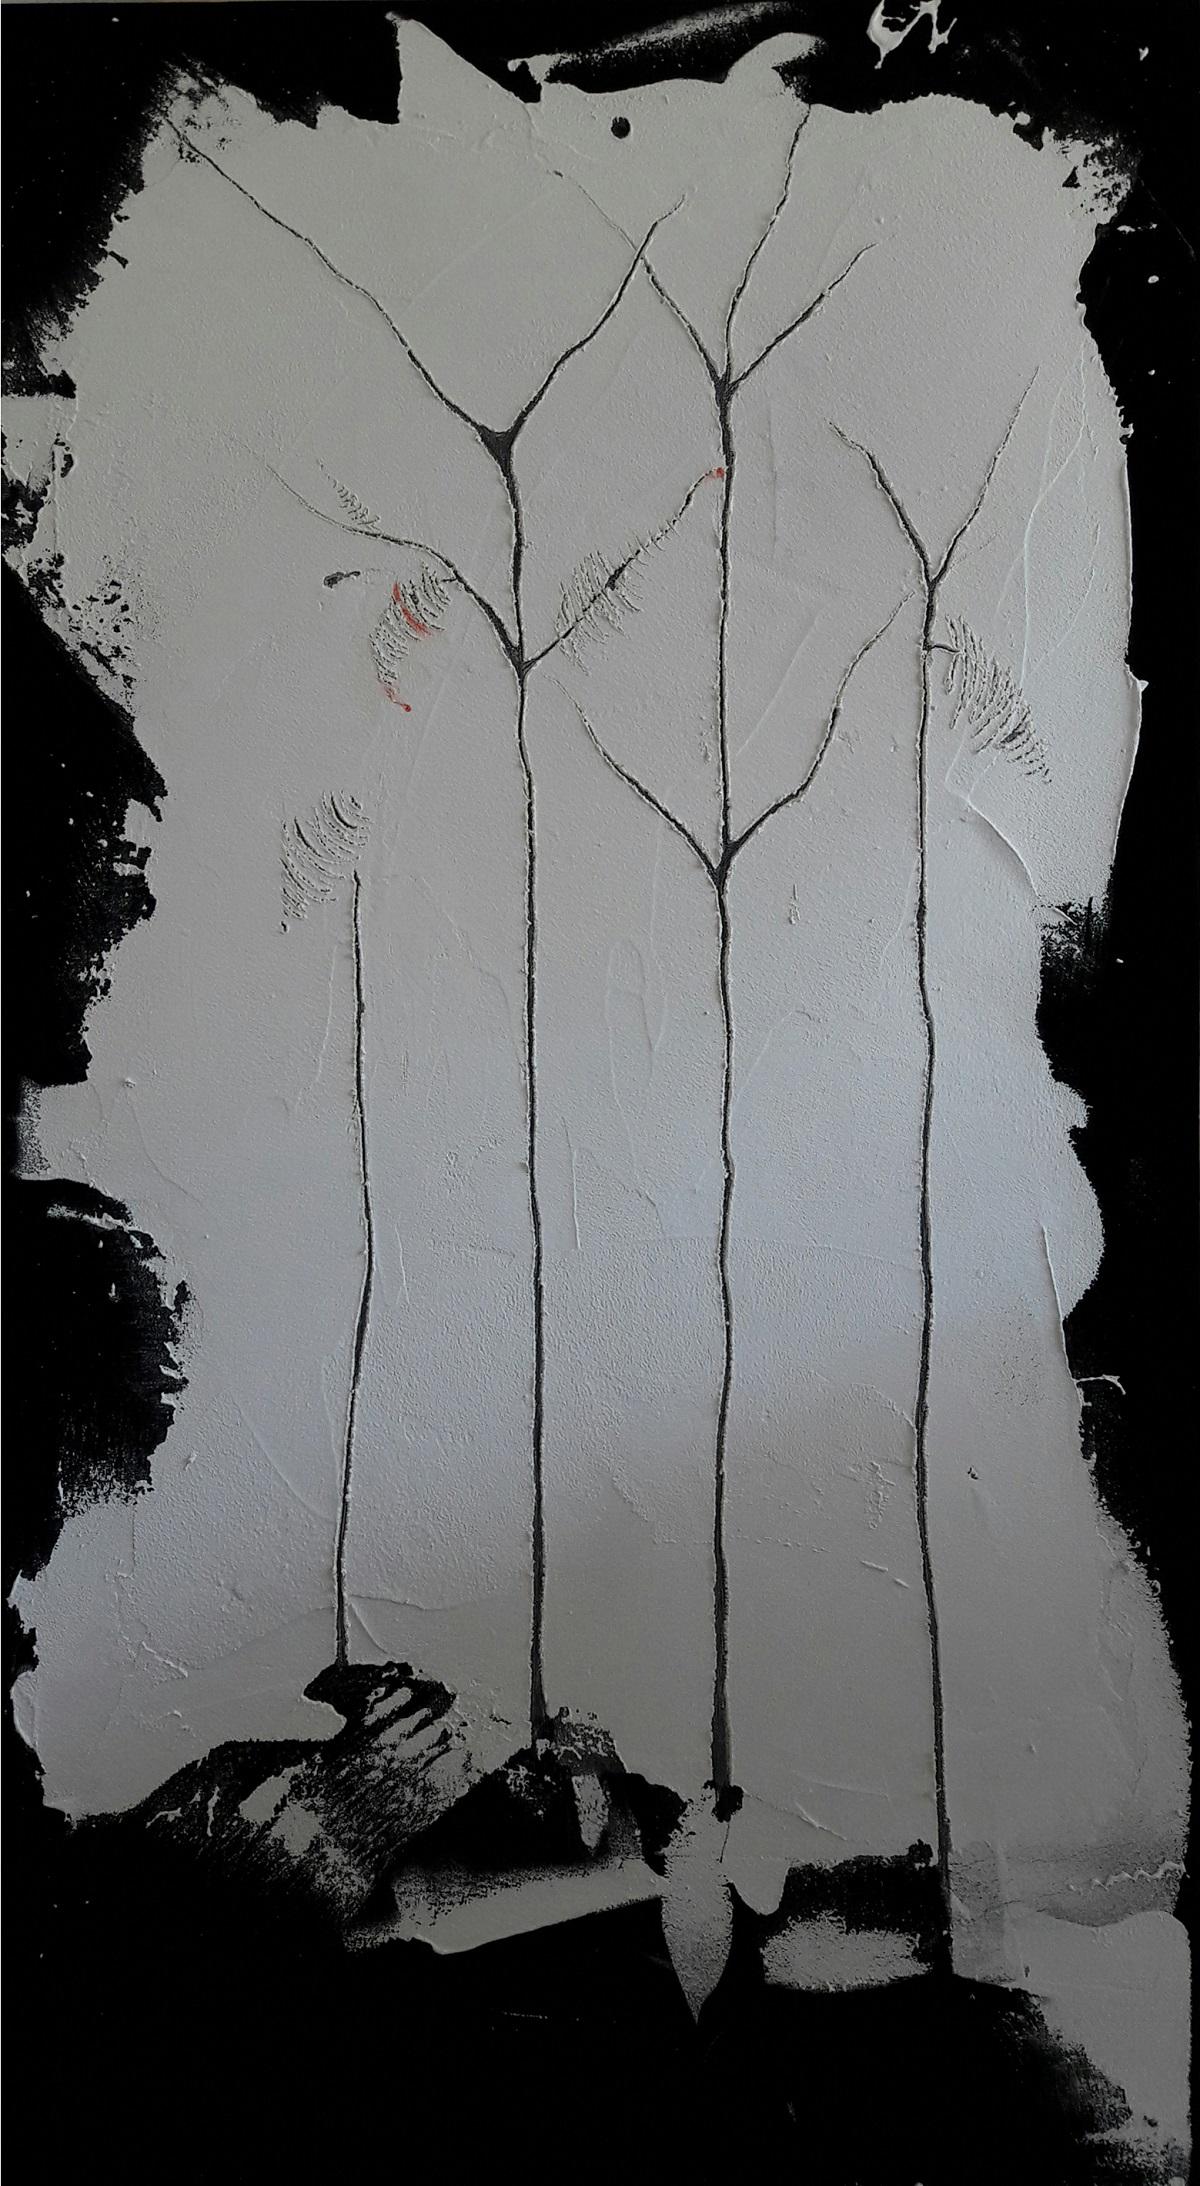 Raffaella Zanzani – Arbusti silenziosi